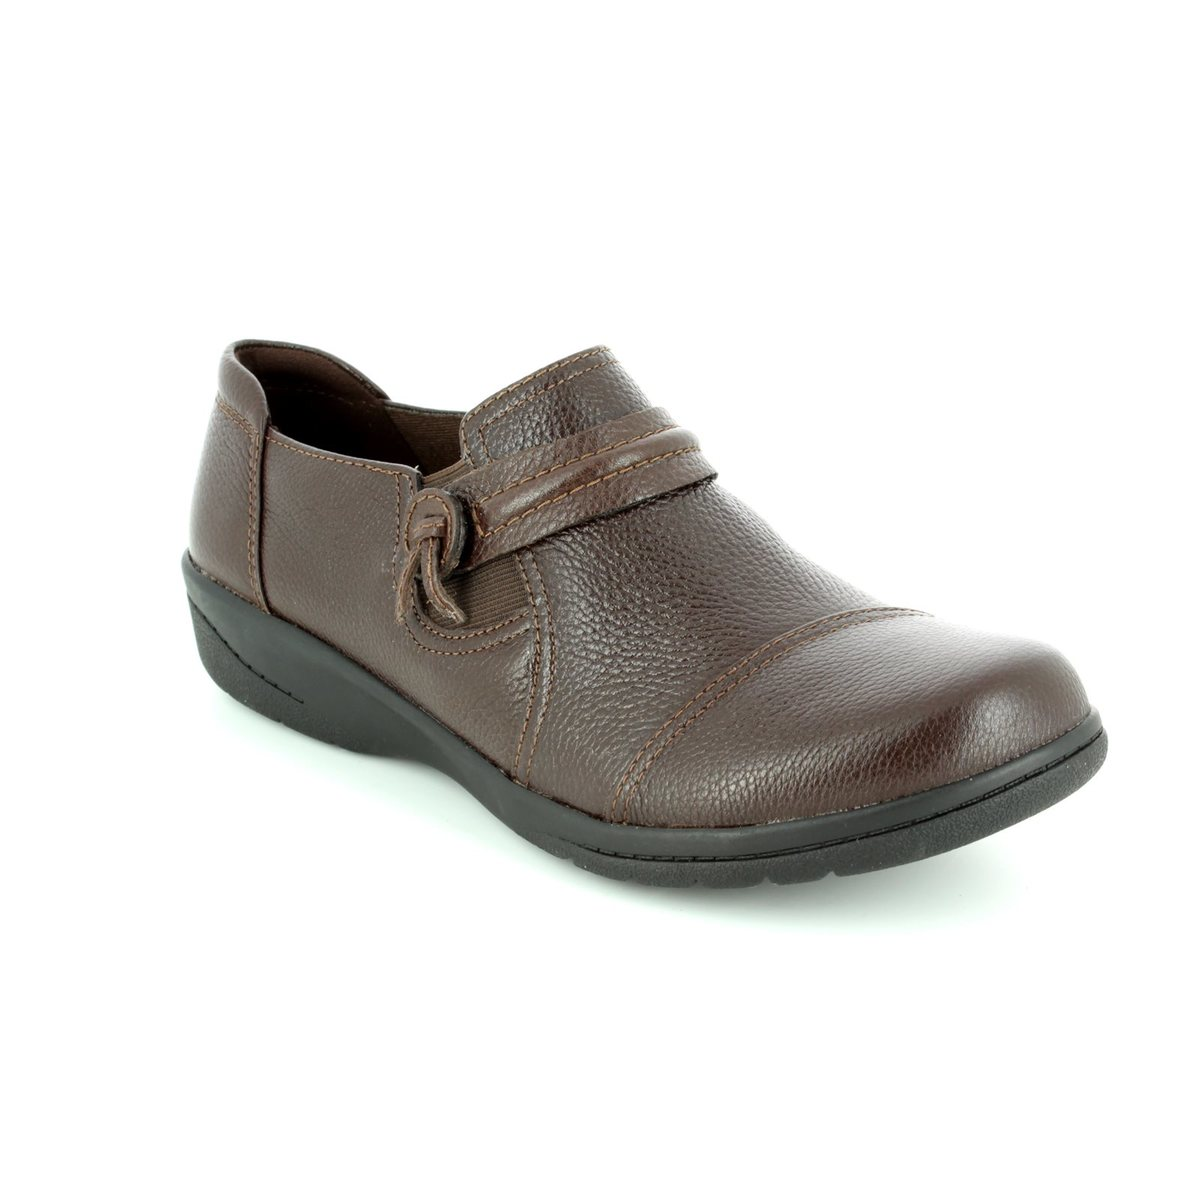 bea47ee524bf Clarks Comfort Shoes - Dark brown - 2893 14D CHEYN MADI